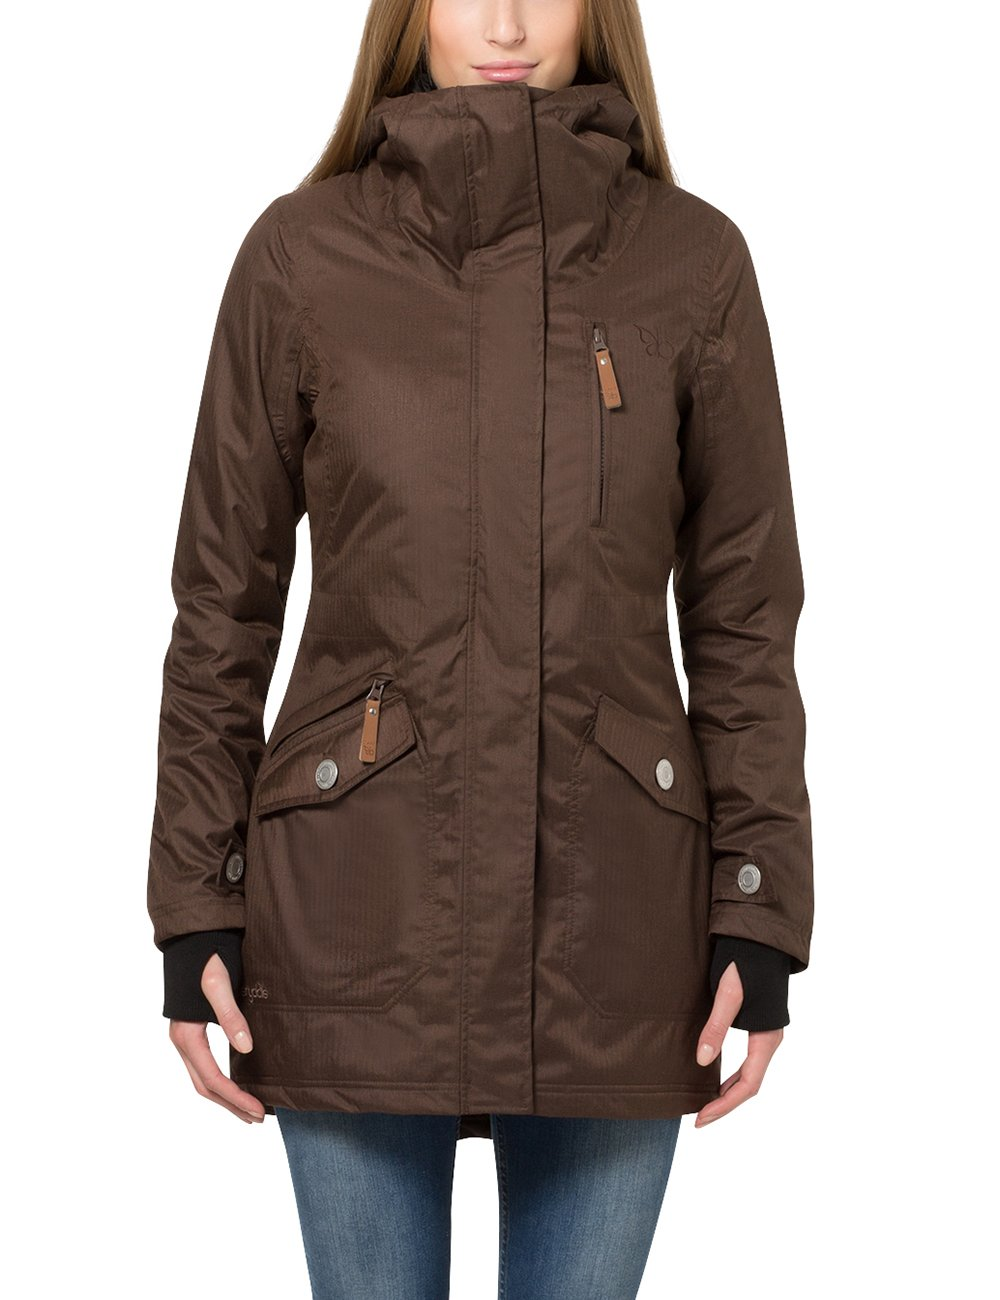 Berydale Women's Wind- and Waterproof Parka Long Sleeve Jacket Summary GmbH (Apparel) BD100